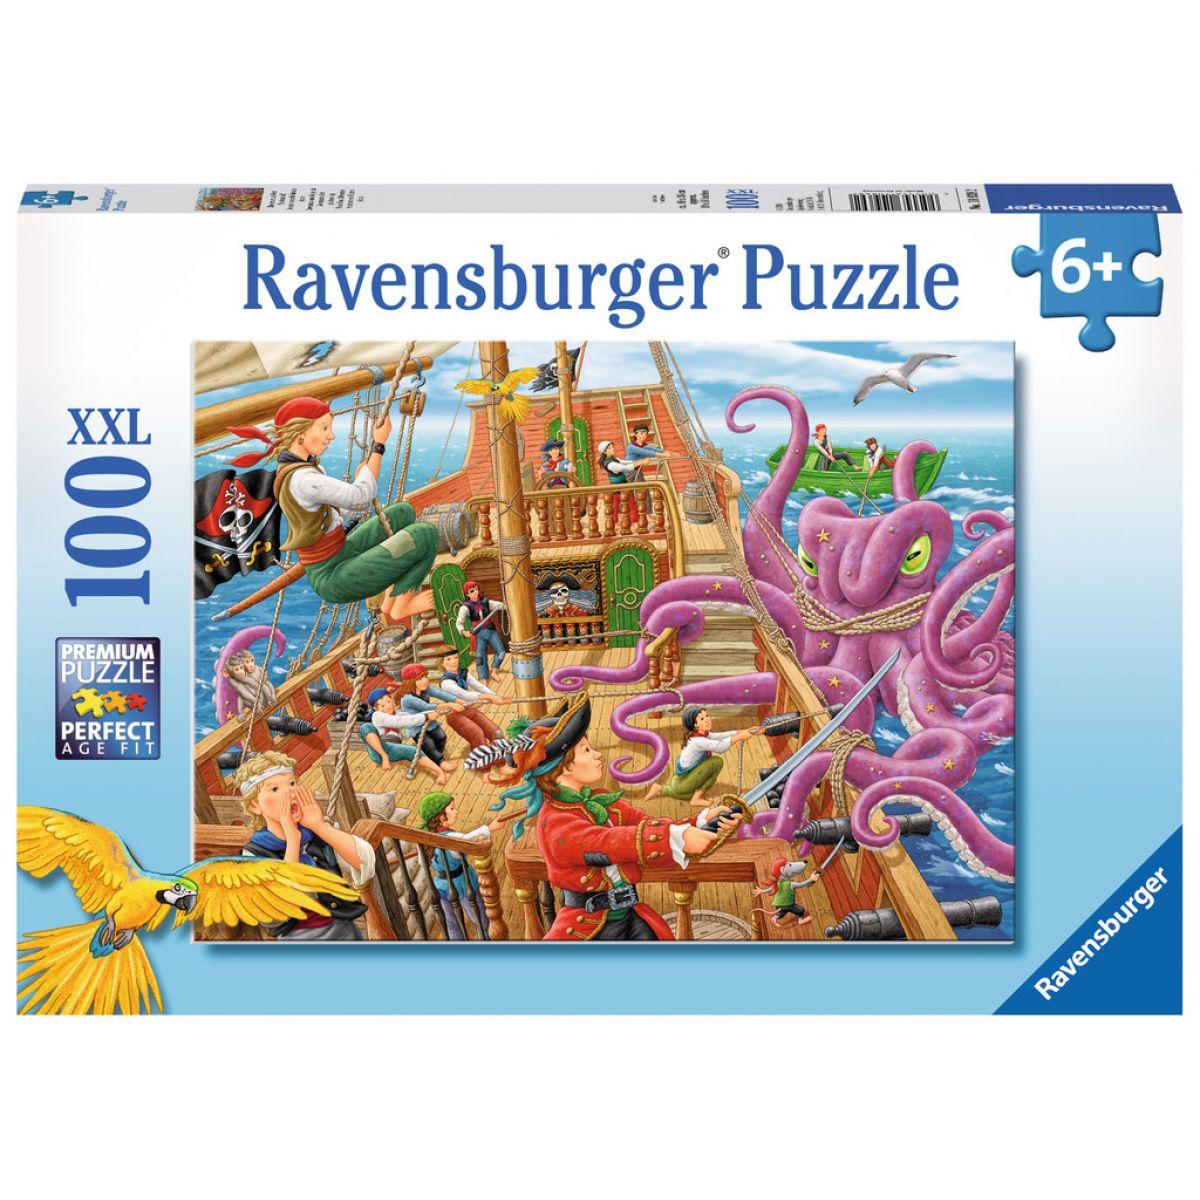 Ravensburger Puzzle XXL Dobrodružstvo na pirátskej lodi 100 dielikov